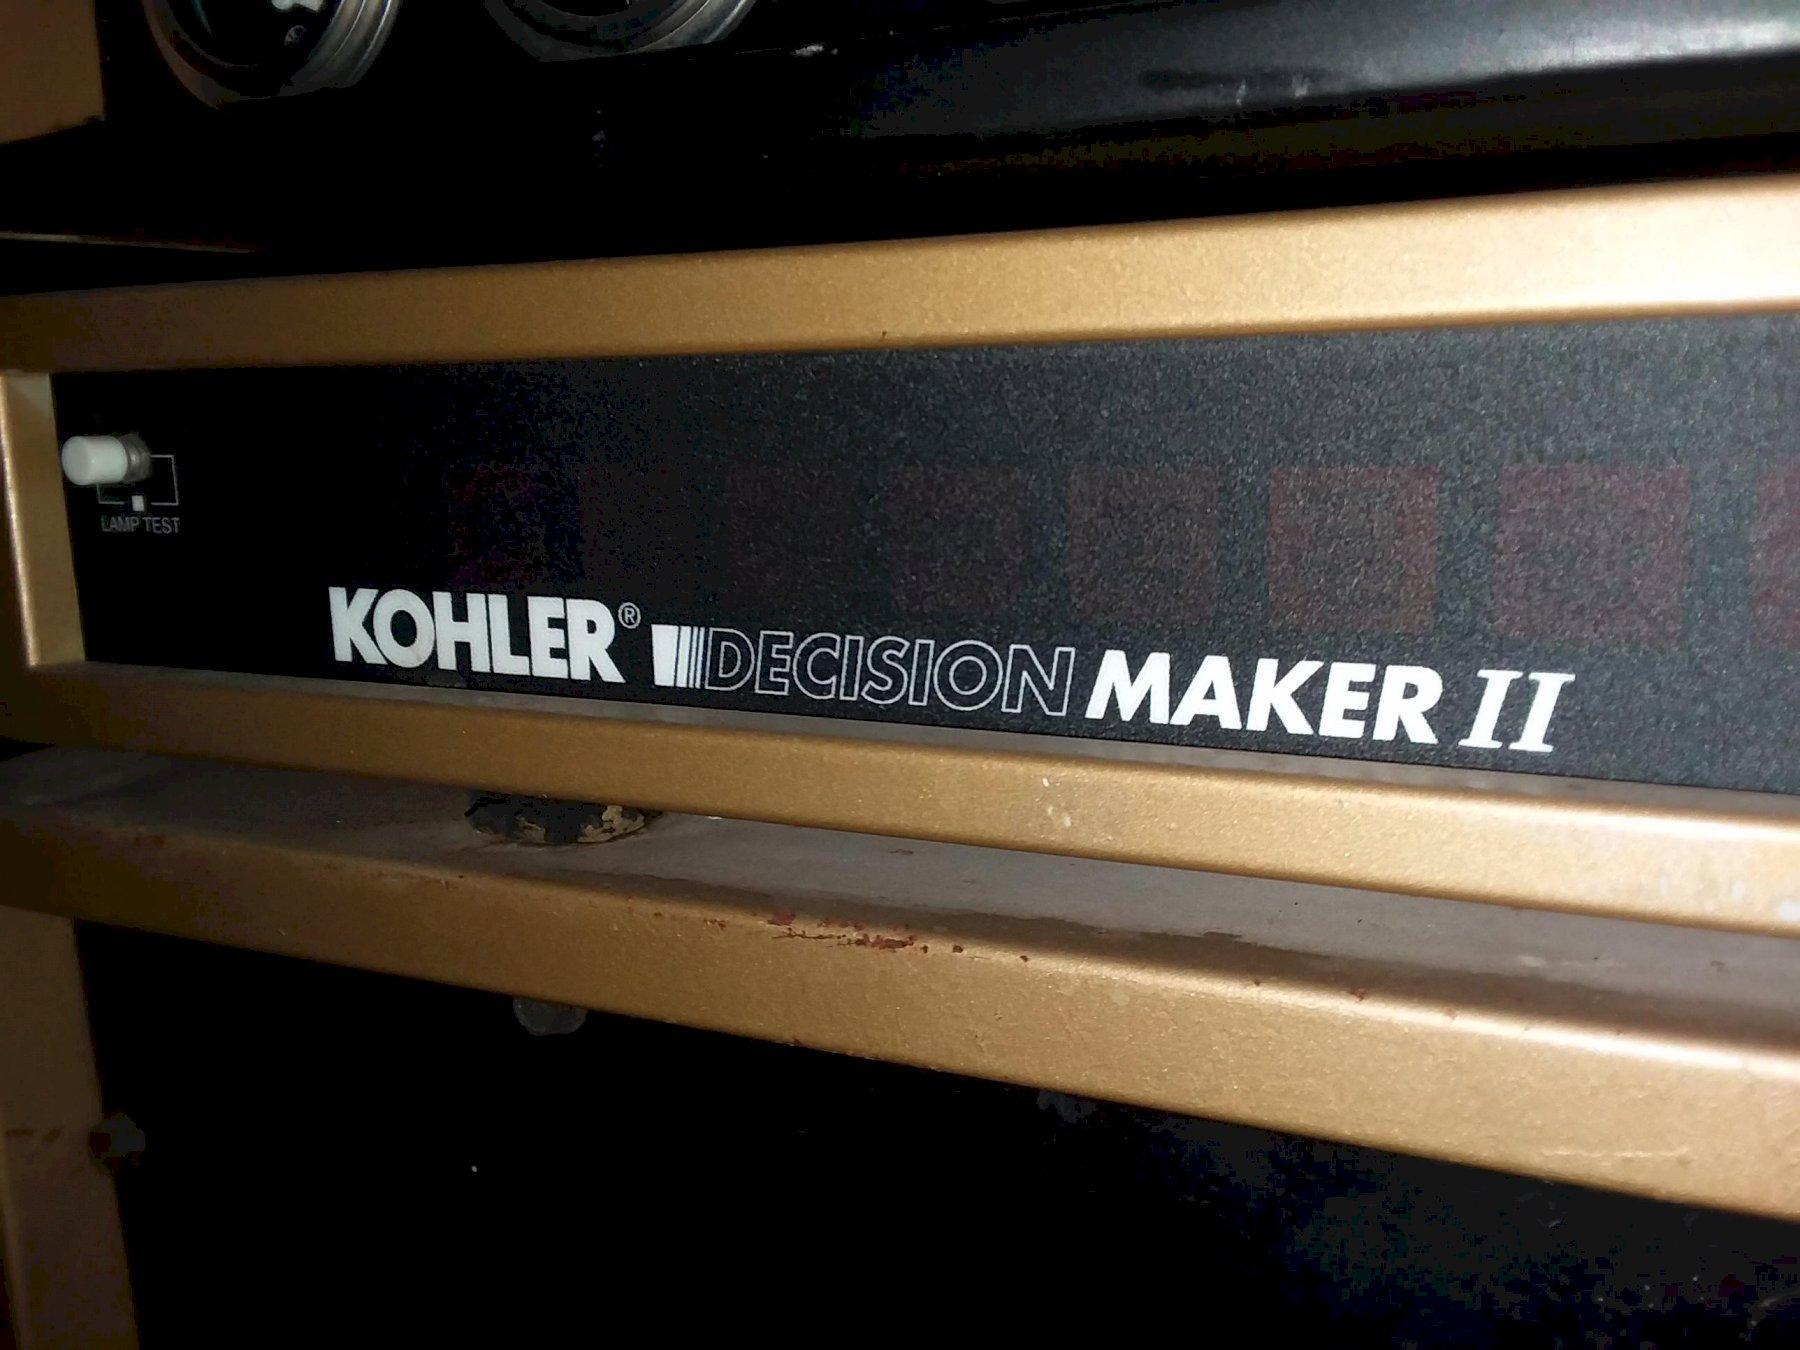 (1) PREOWNED KOHLER DECISION MAKER II GENERATOR SET, MODEL <br>60ROZ81, S/N 055647